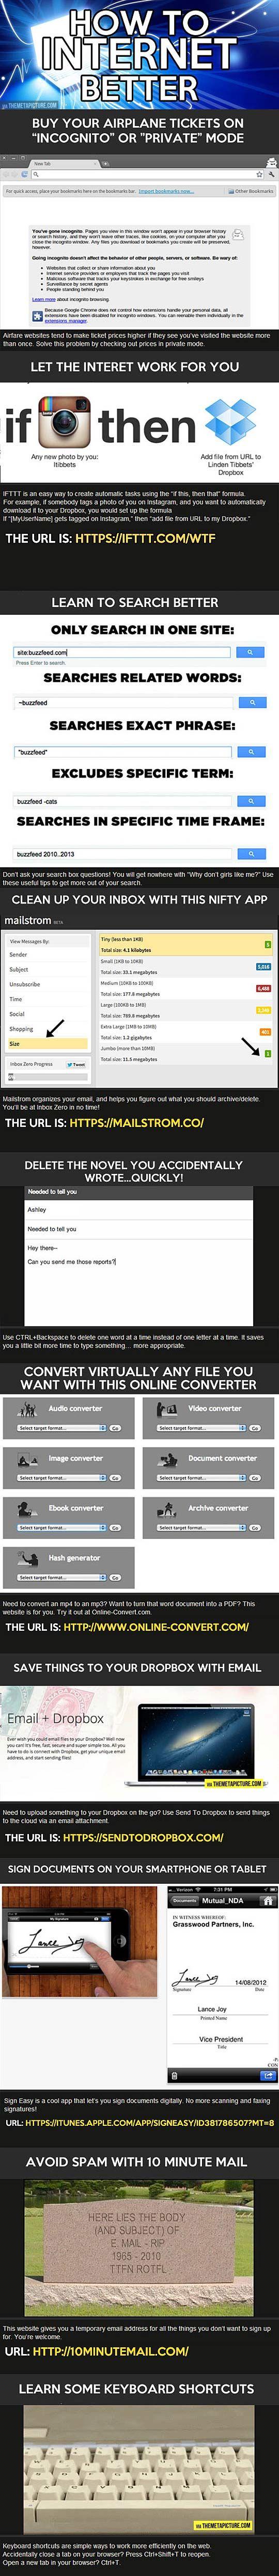 funny-how-internet-tips-tricks